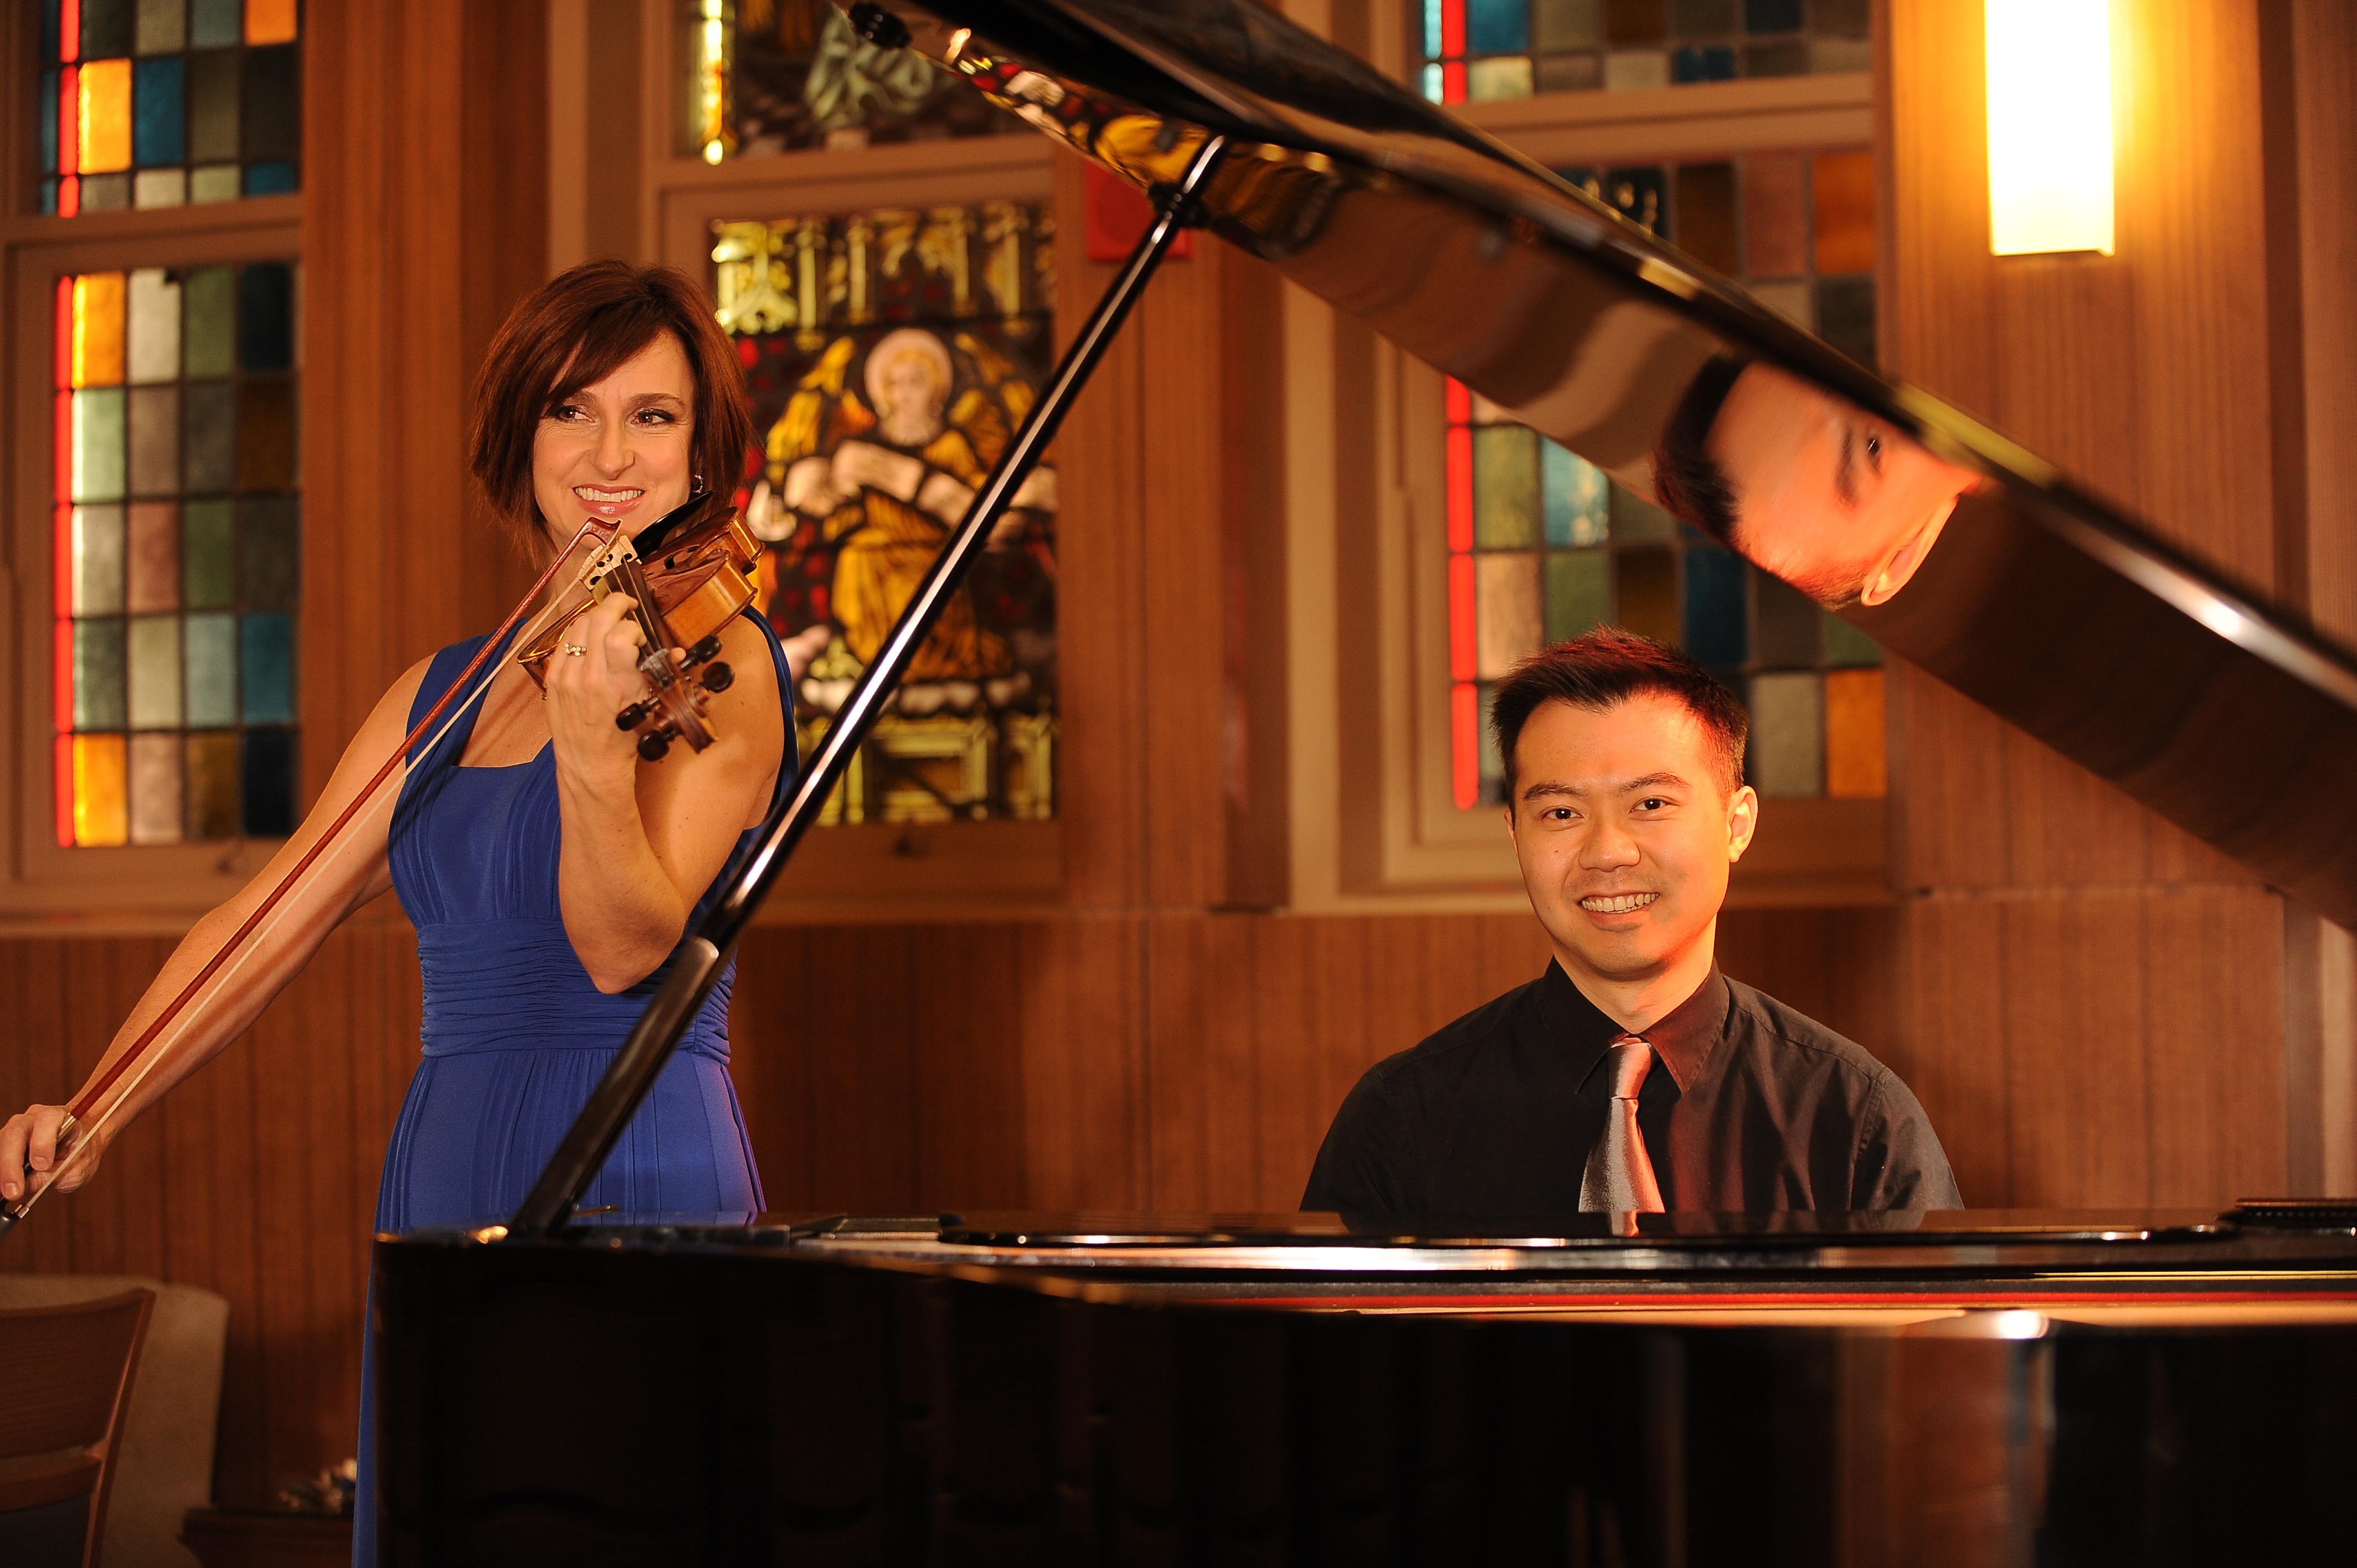 Amy Thiaville, violin, and Brian Hsu, piano